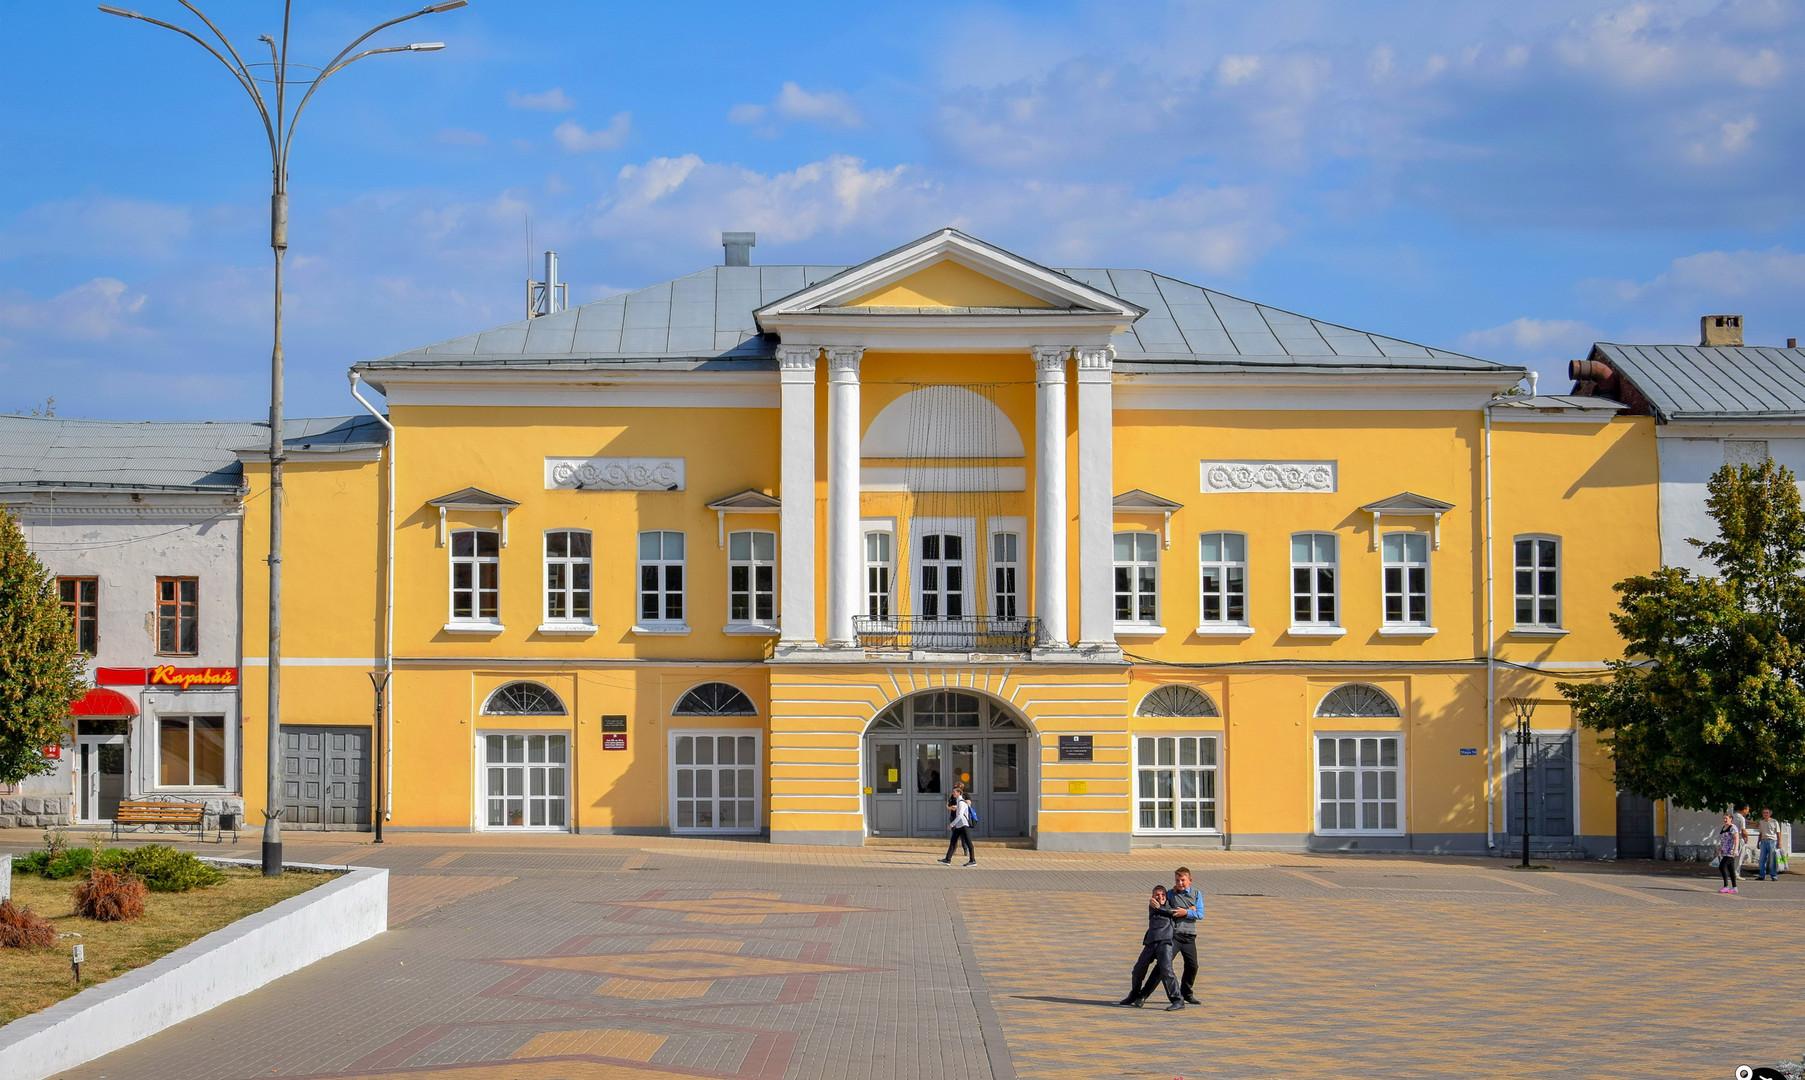 Площадь Ленина, Елец